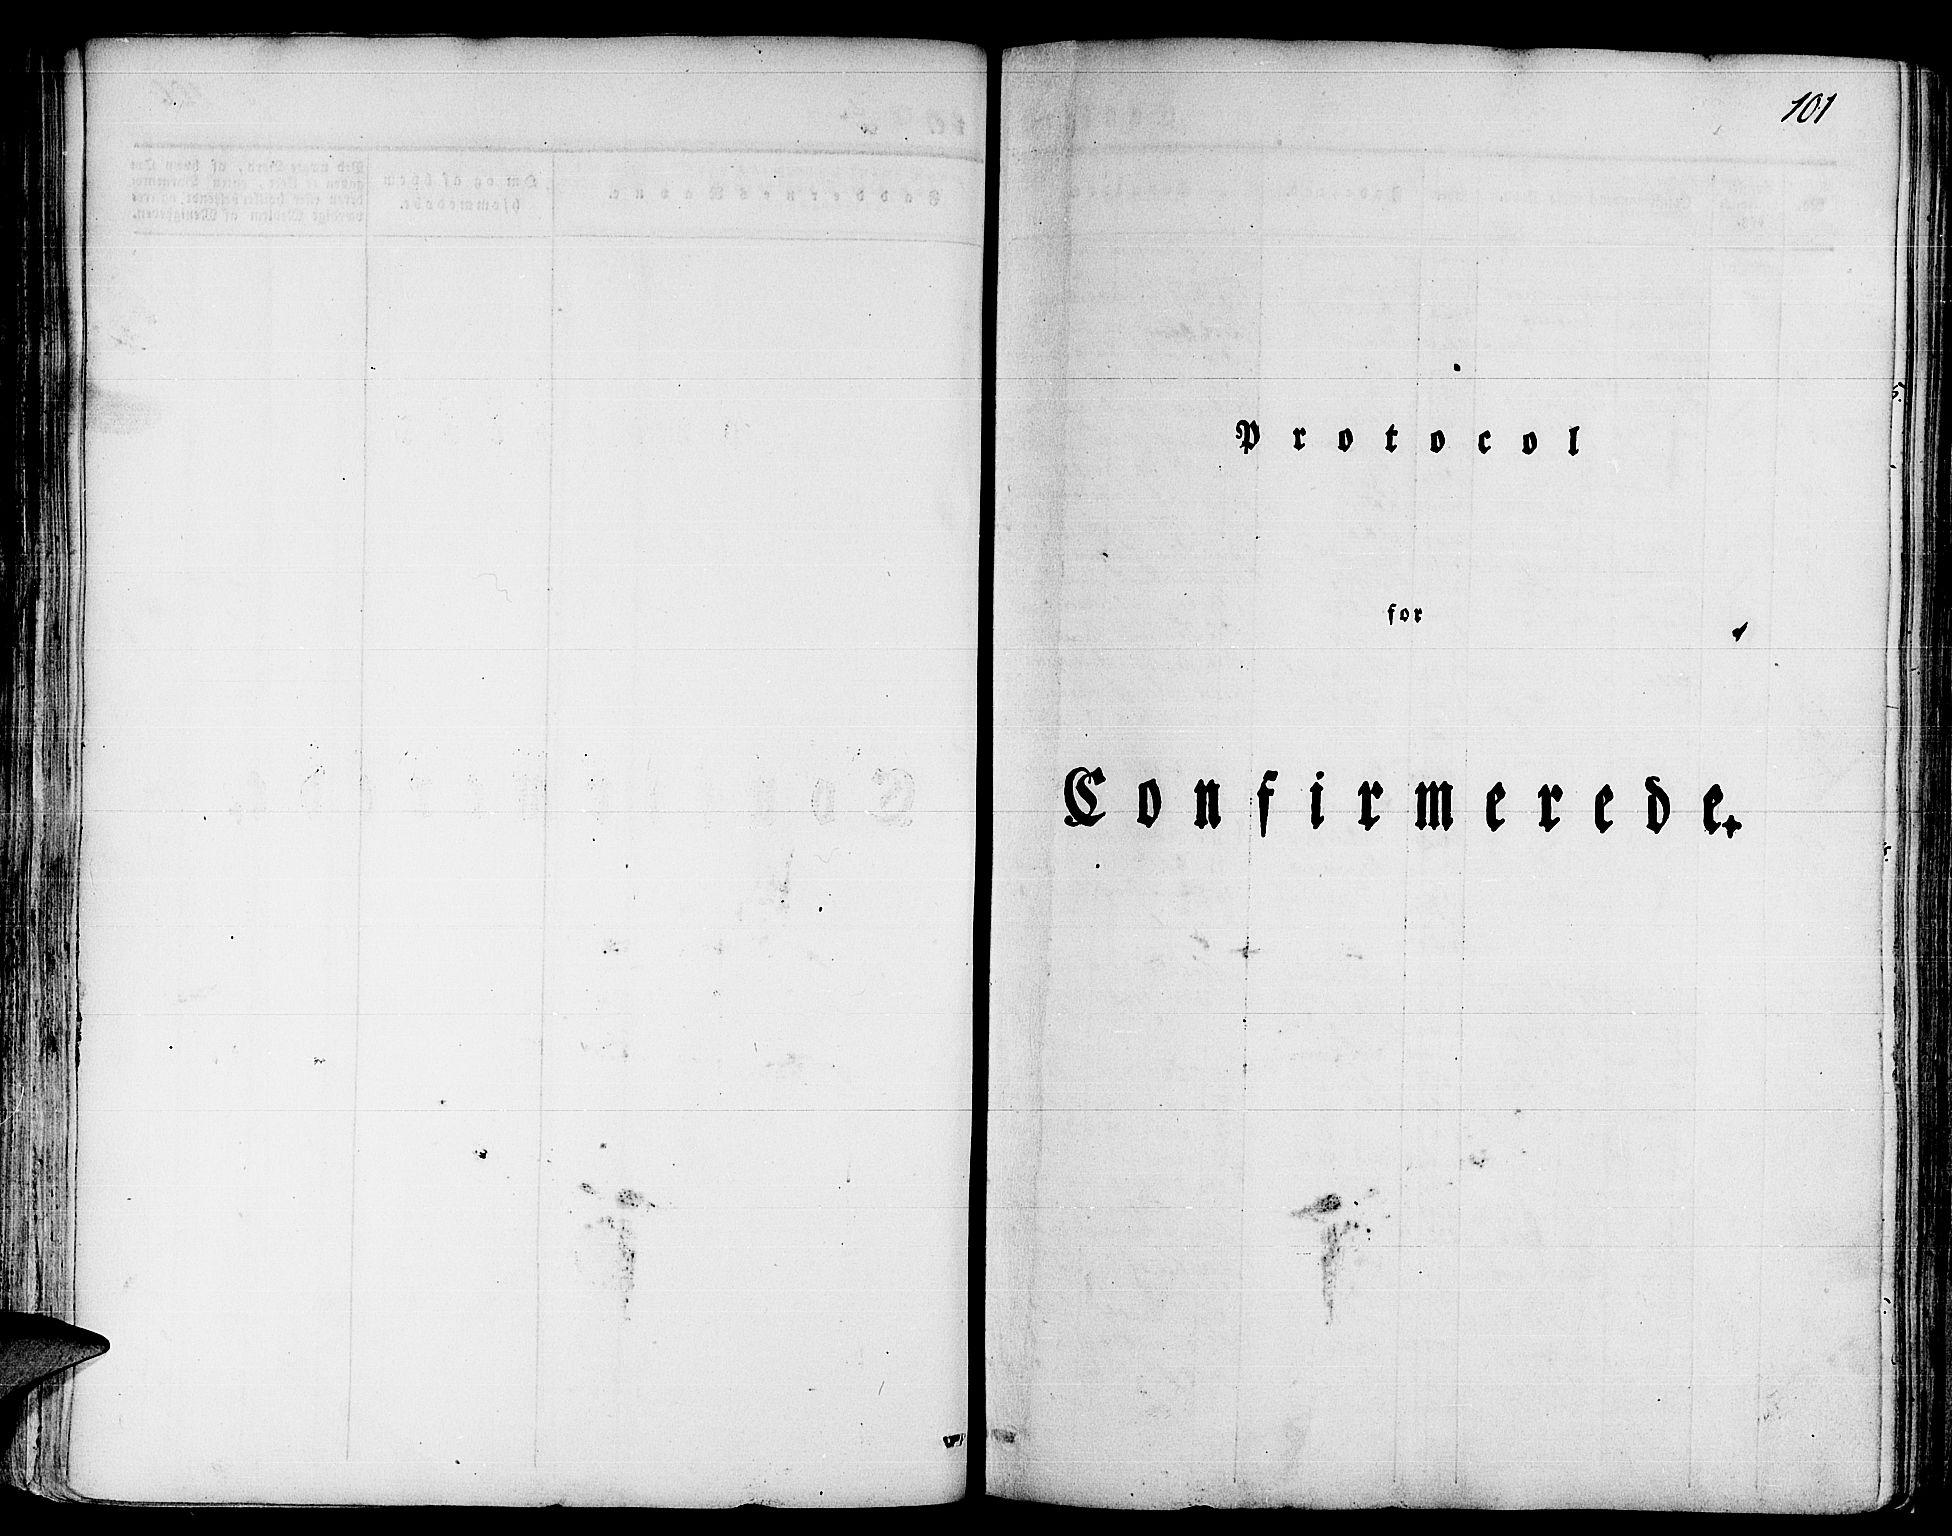 SAB, Gloppen Sokneprestembete, H/Haa/Haaa/L0007: Ministerialbok nr. A 7, 1827-1837, s. 101